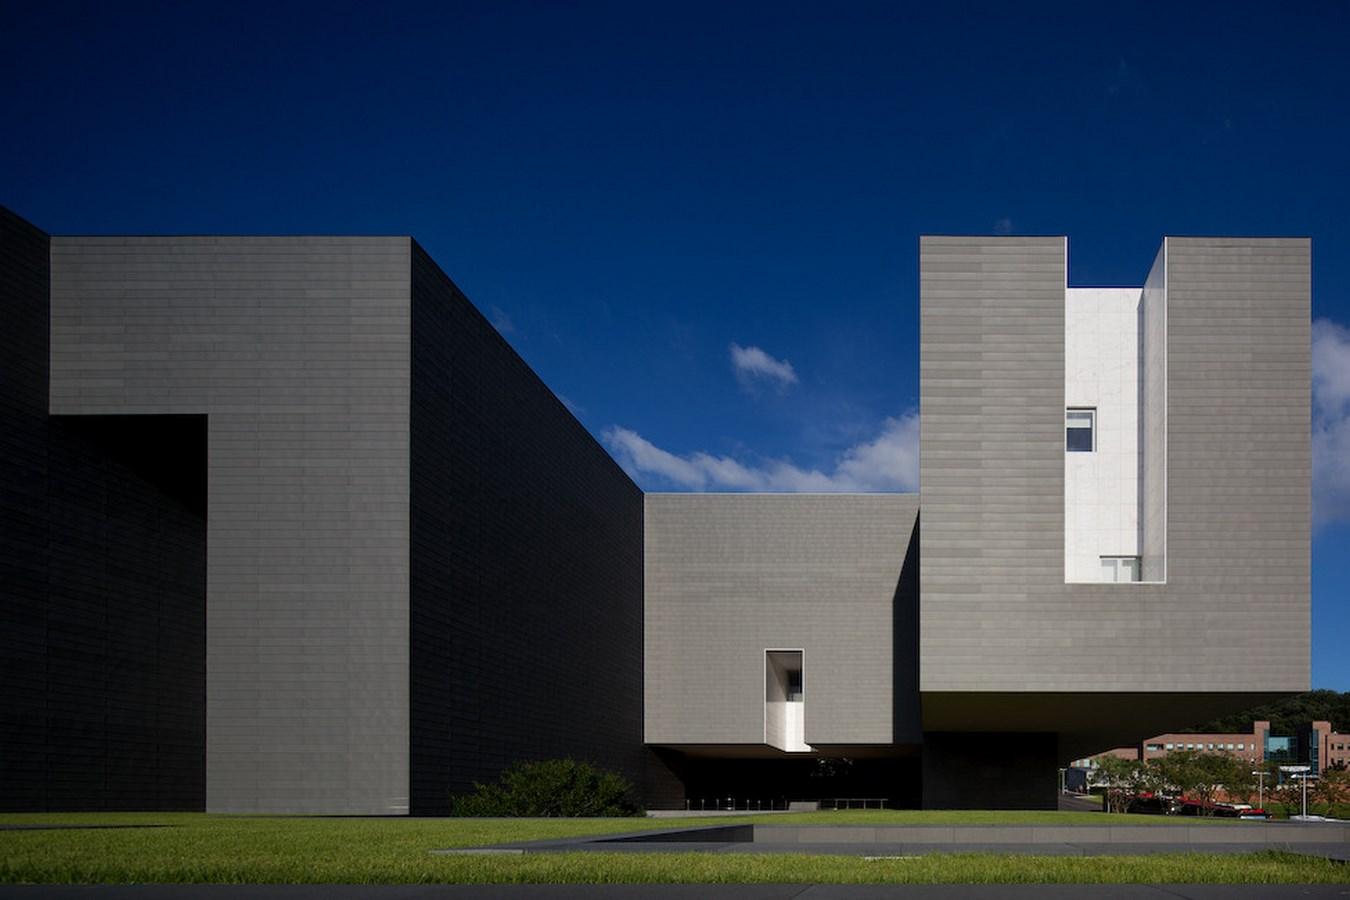 A305 - 15 Top works of Alvaro Siza - Amore Pacific Research & Design Center